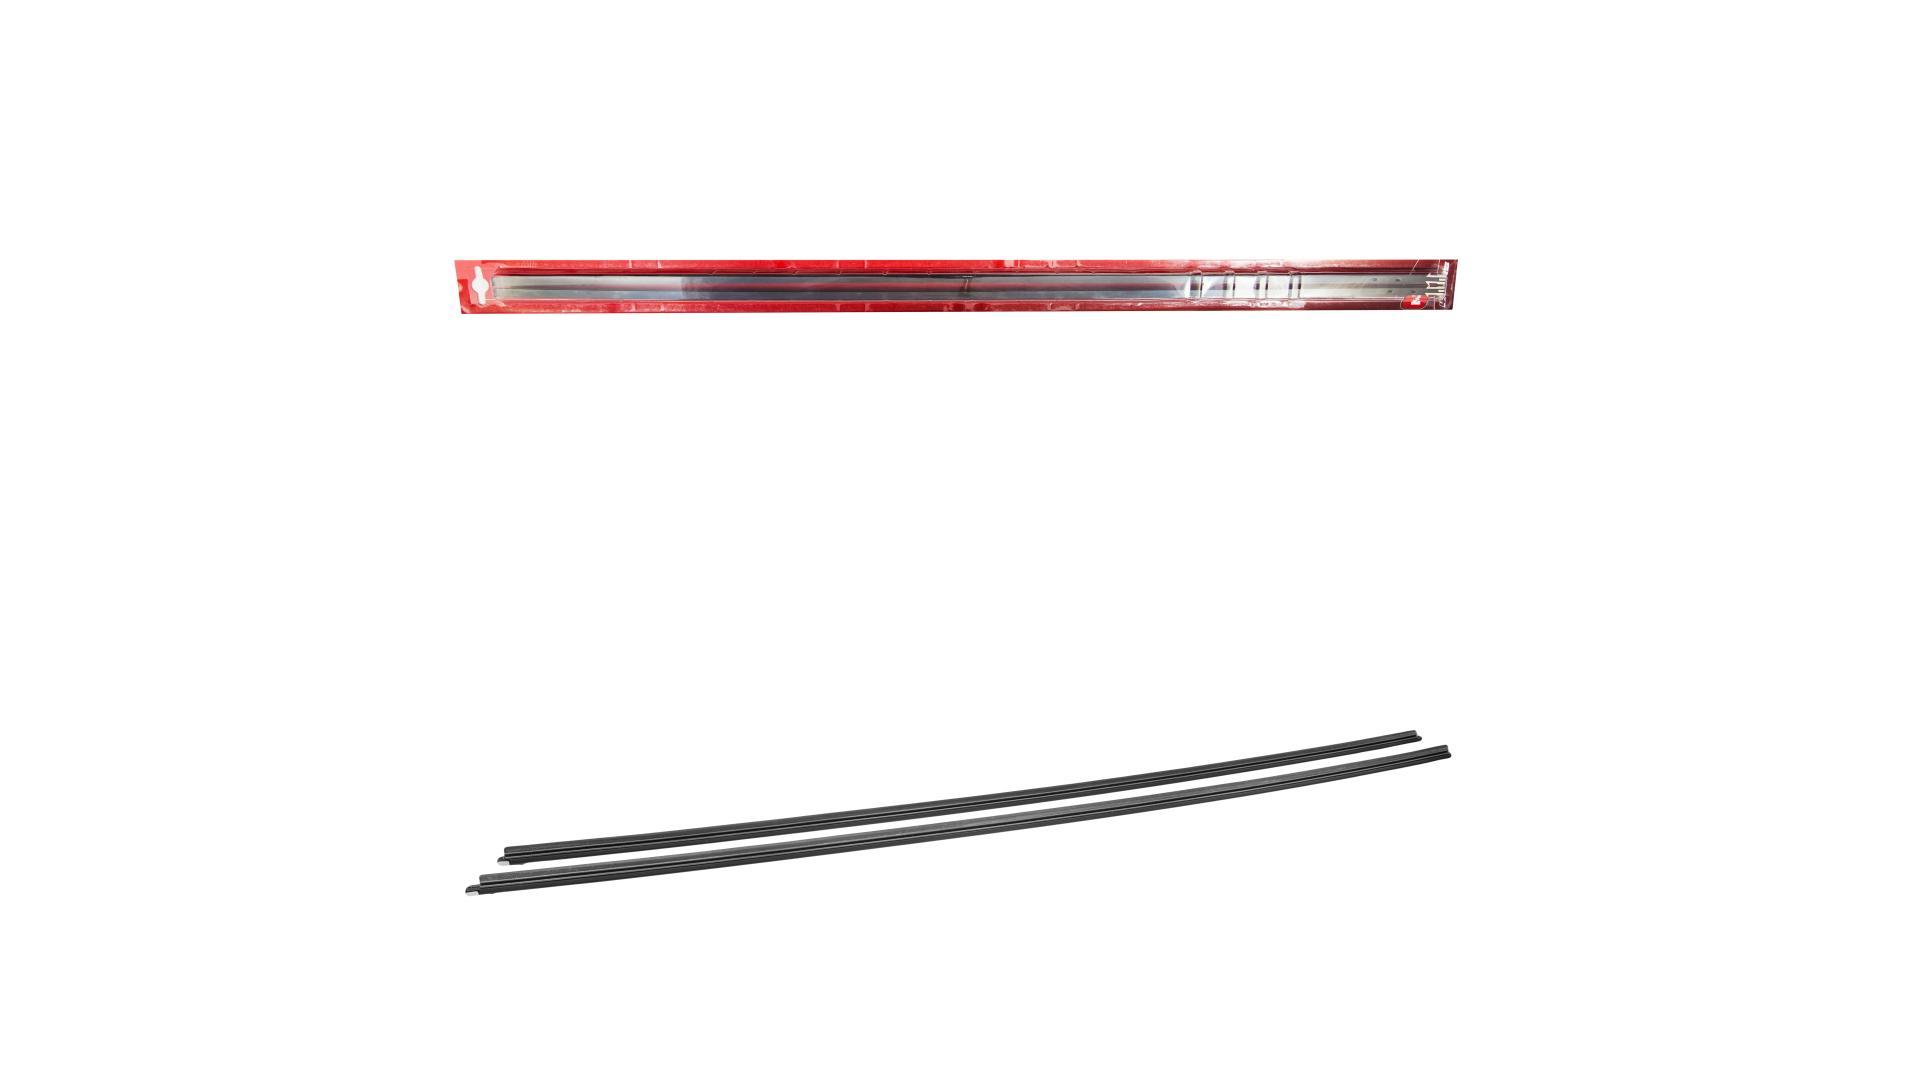 4CARS gumička stierača s lištou 710 mm, 2 ks